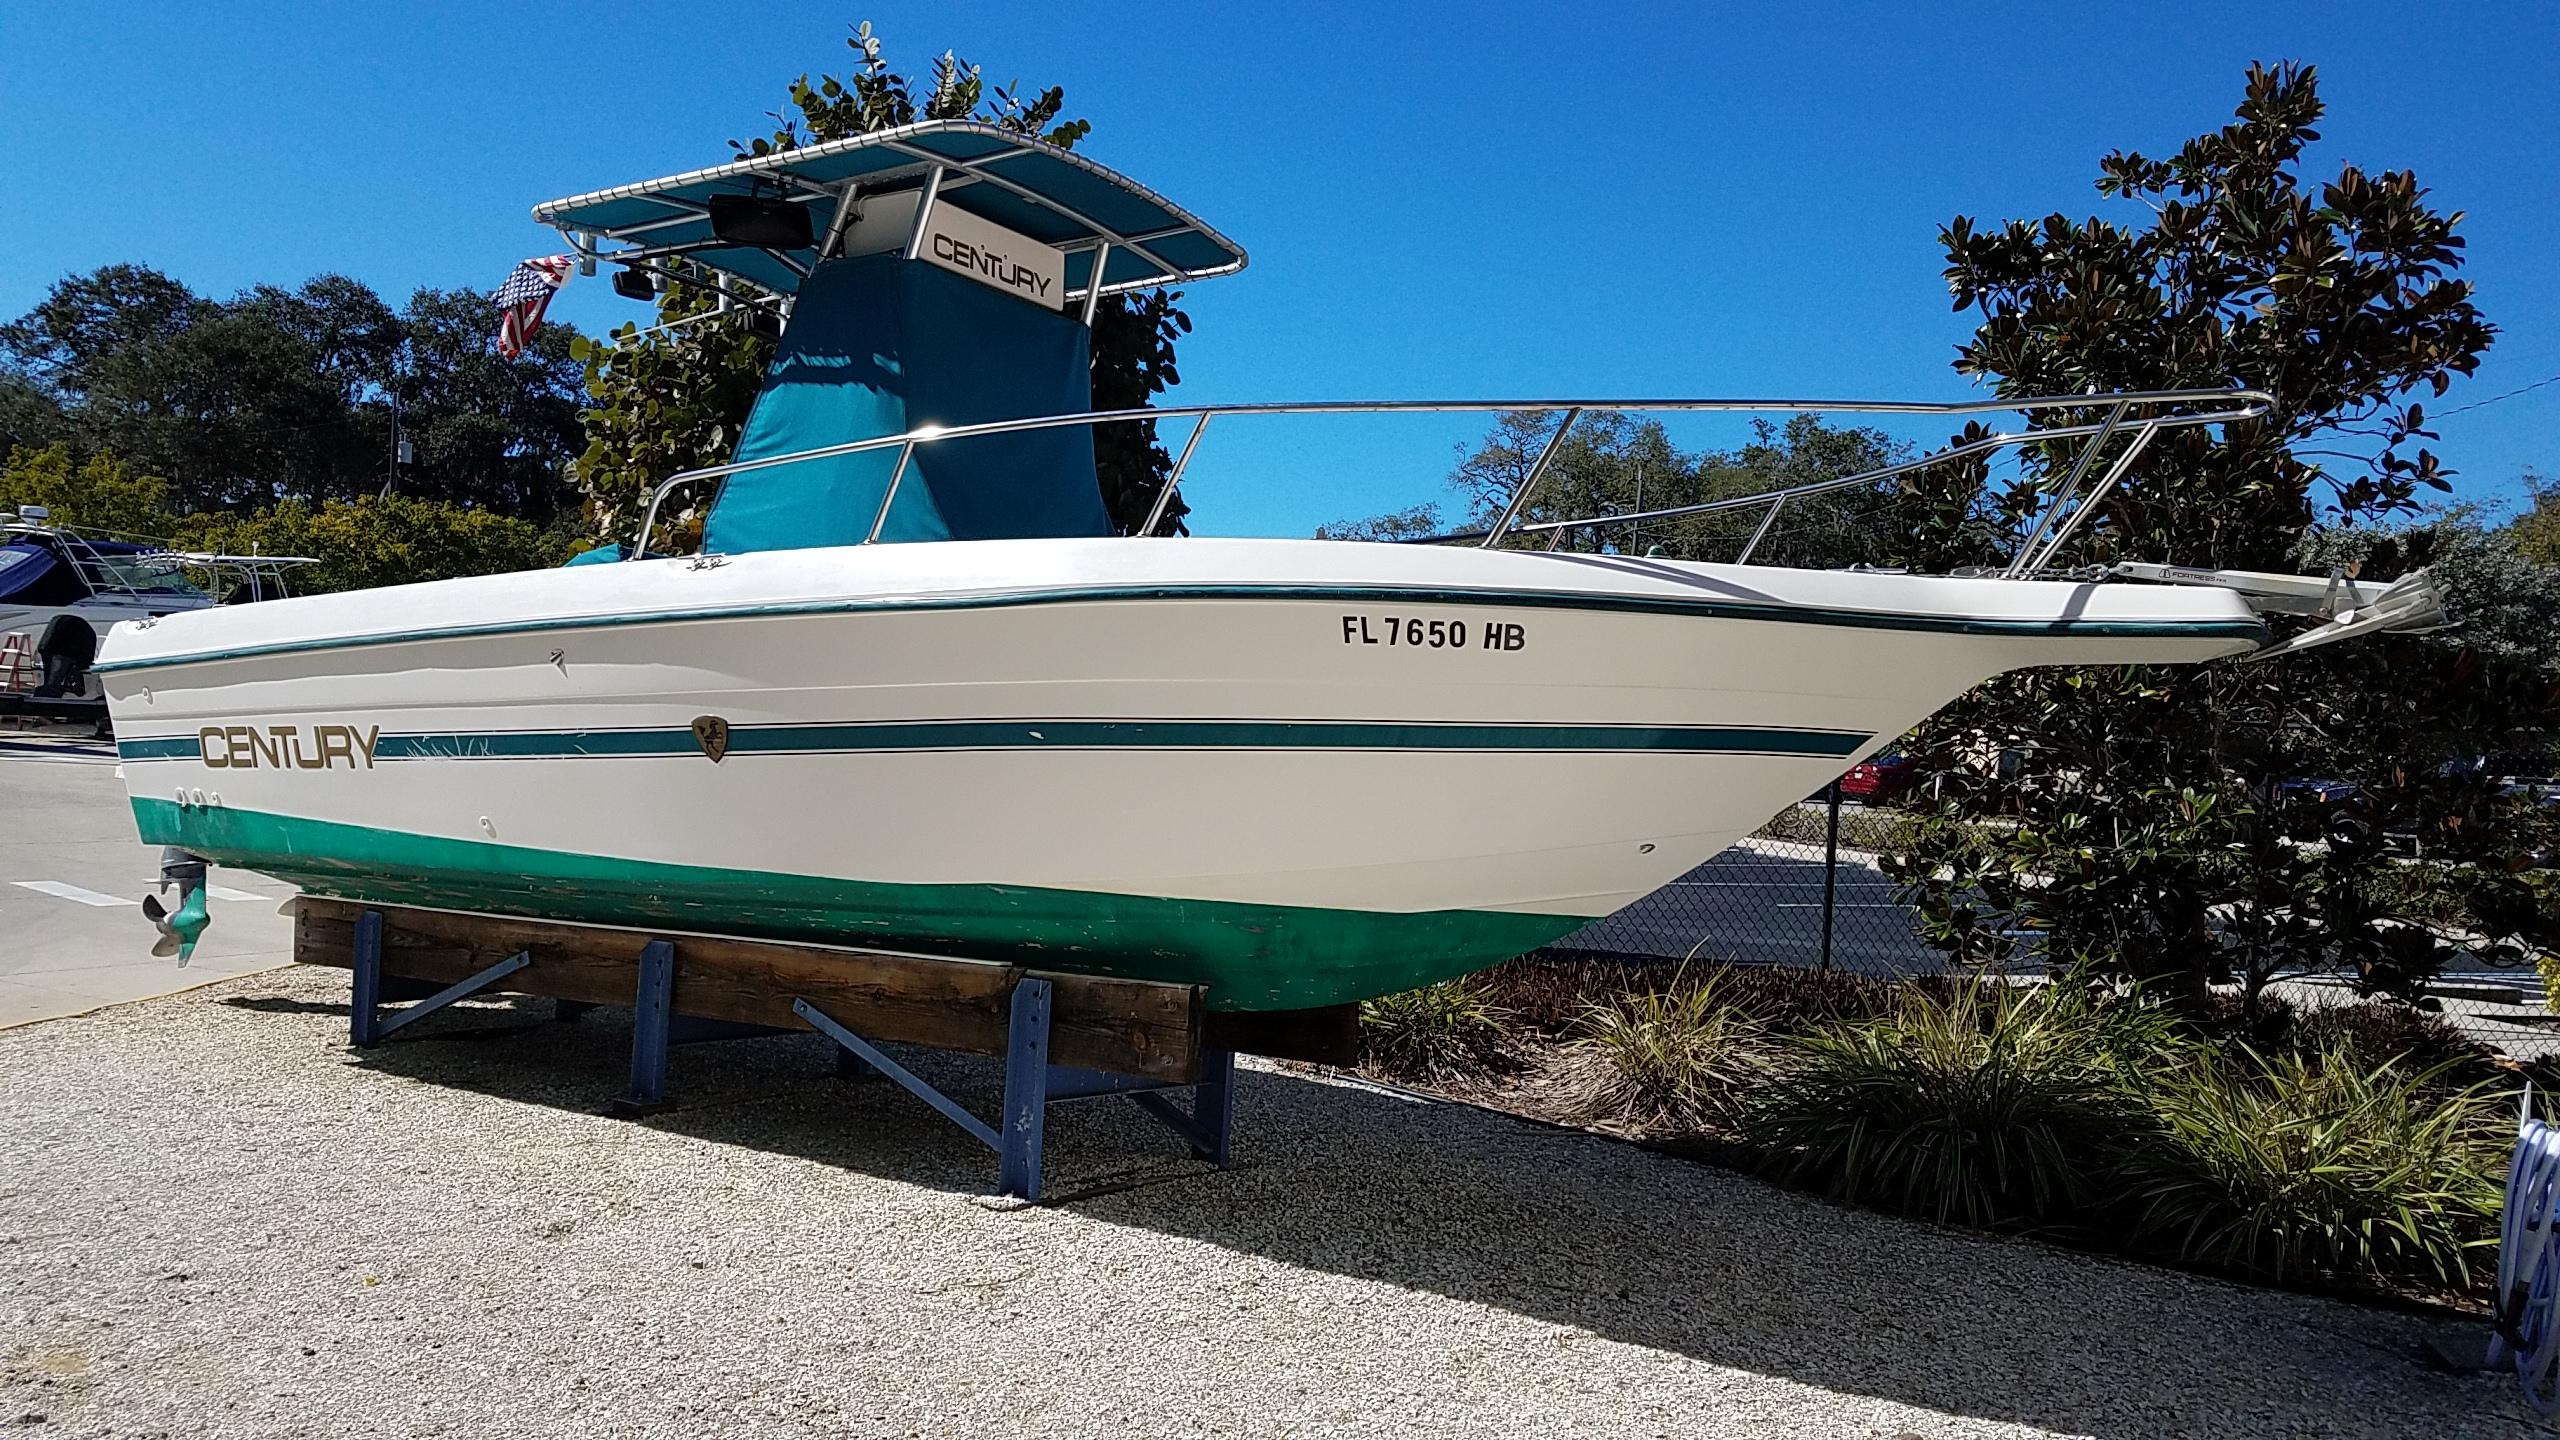 1996 century 2500 25 foot 1996 century motor boat in for Century motors of south florida